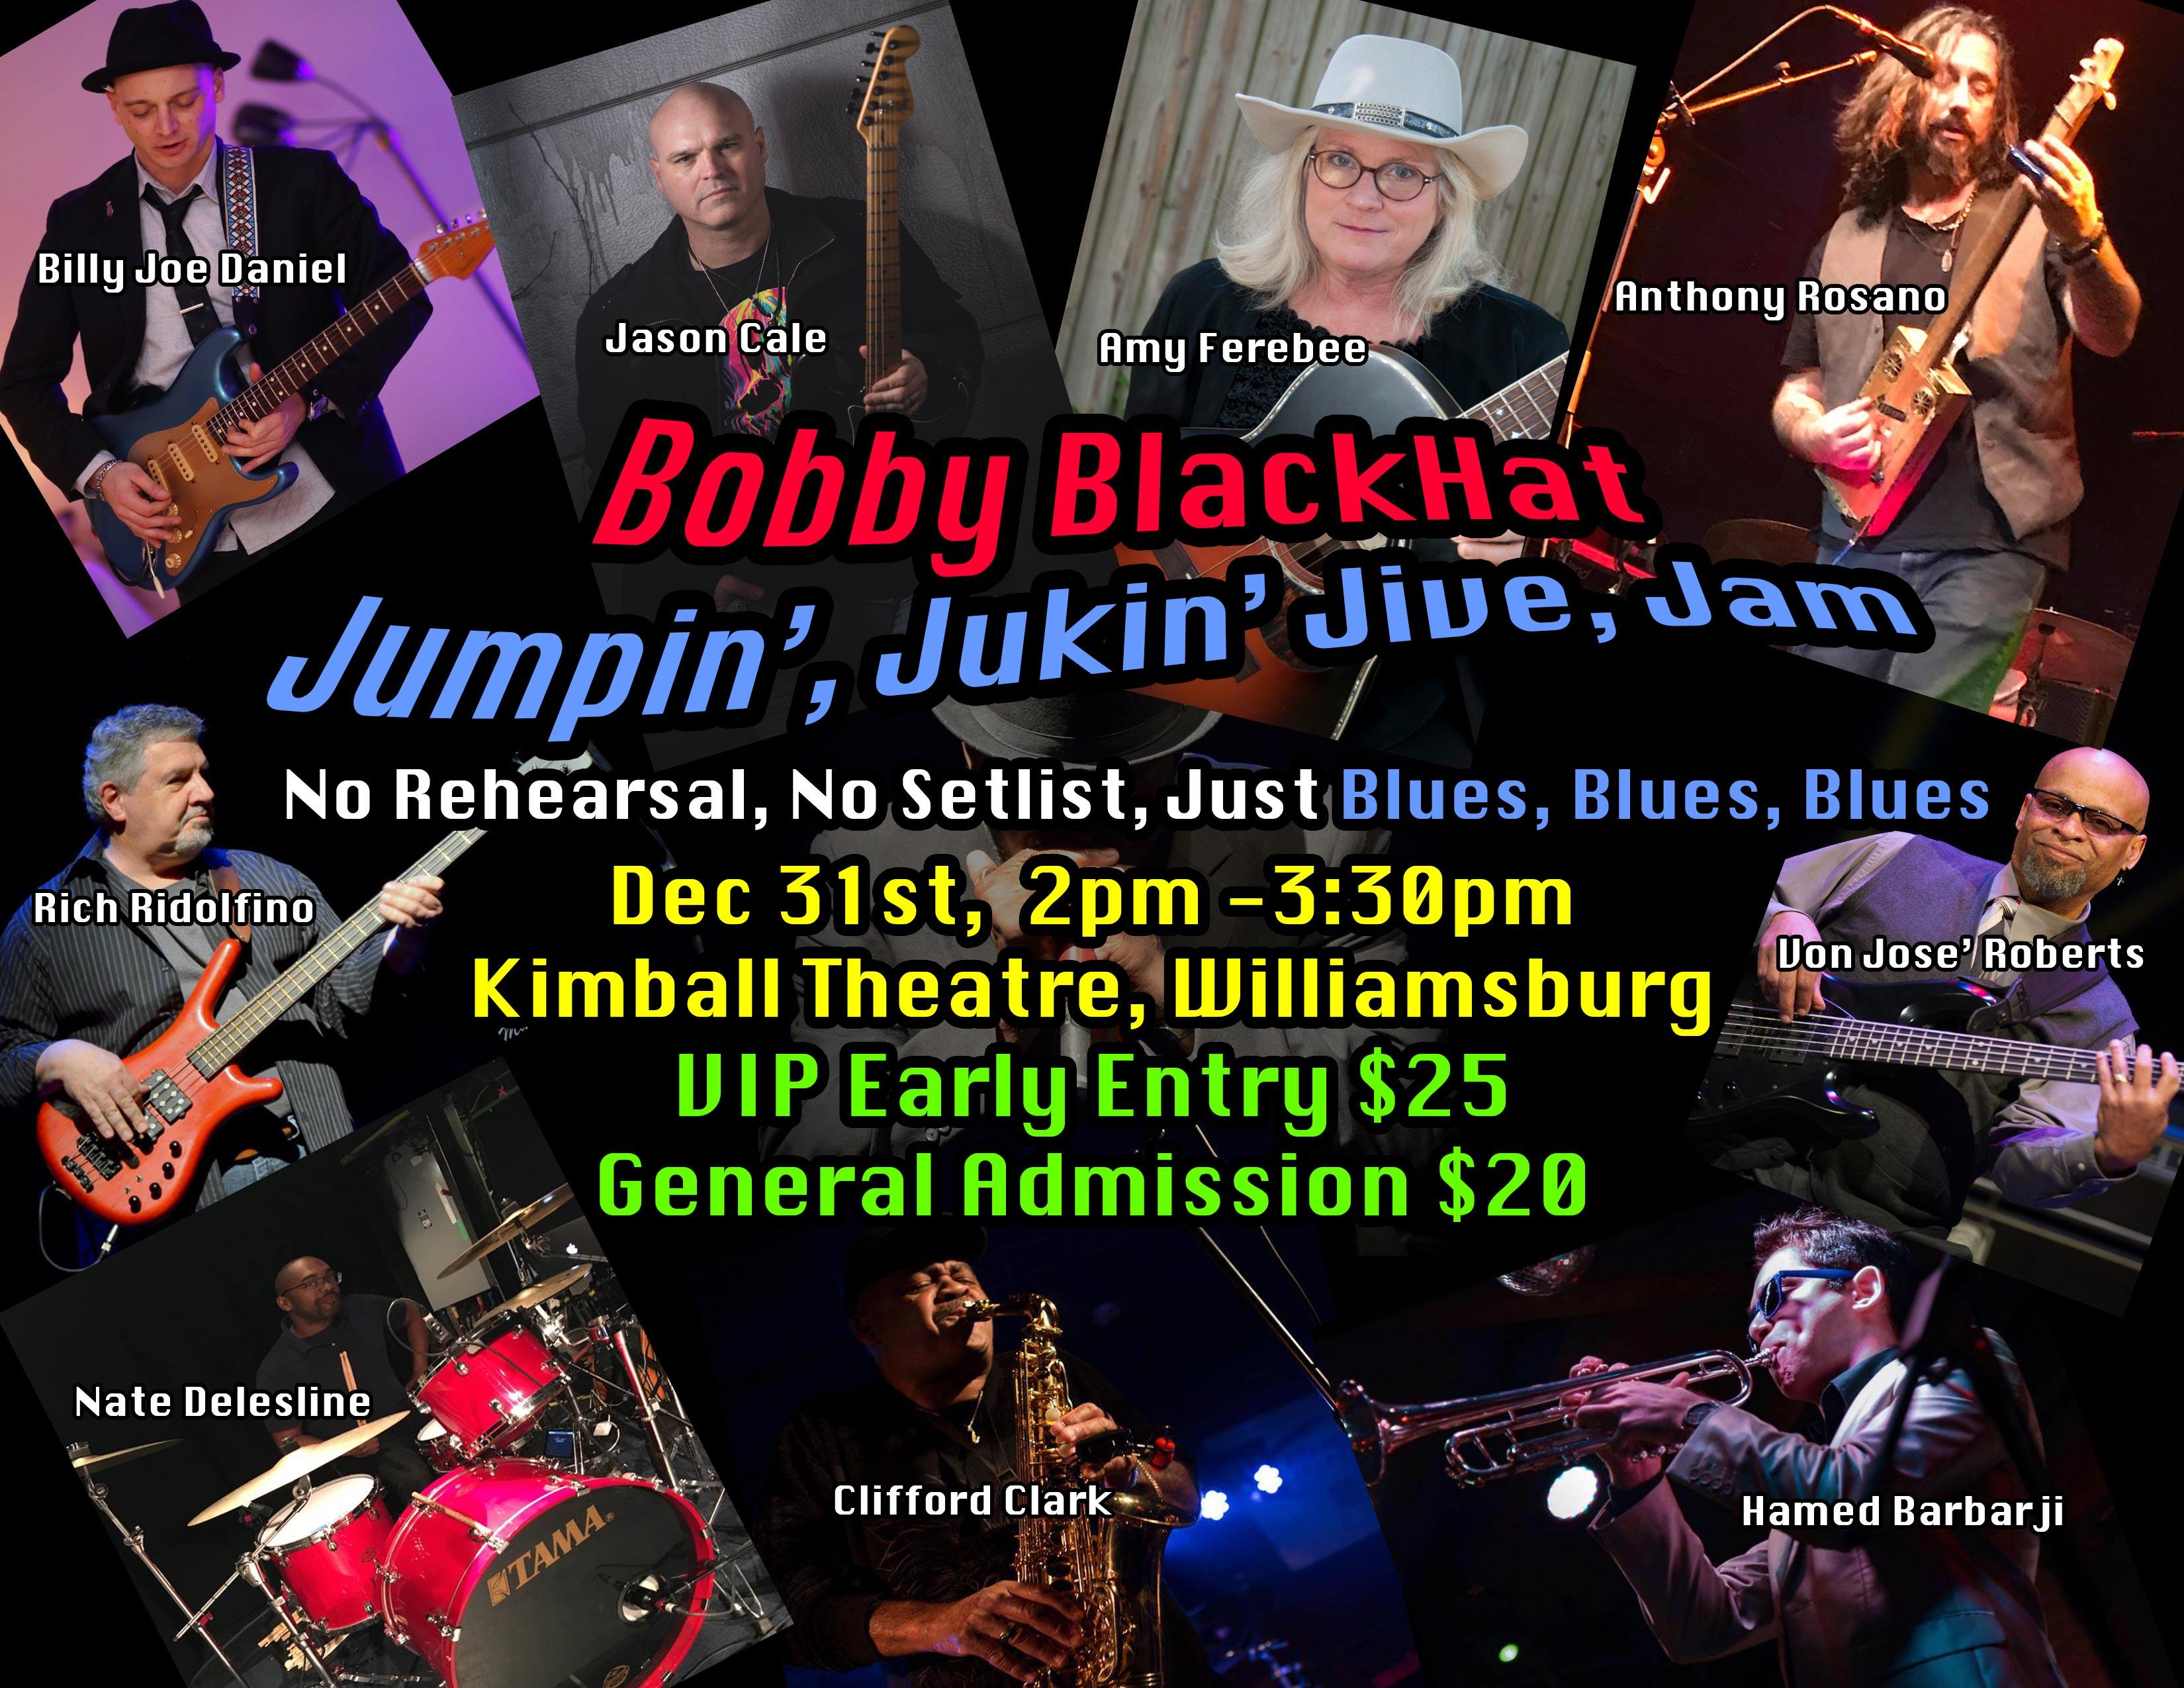 Bobby BlackHat Jumpin', Jukin', Jive, Jam